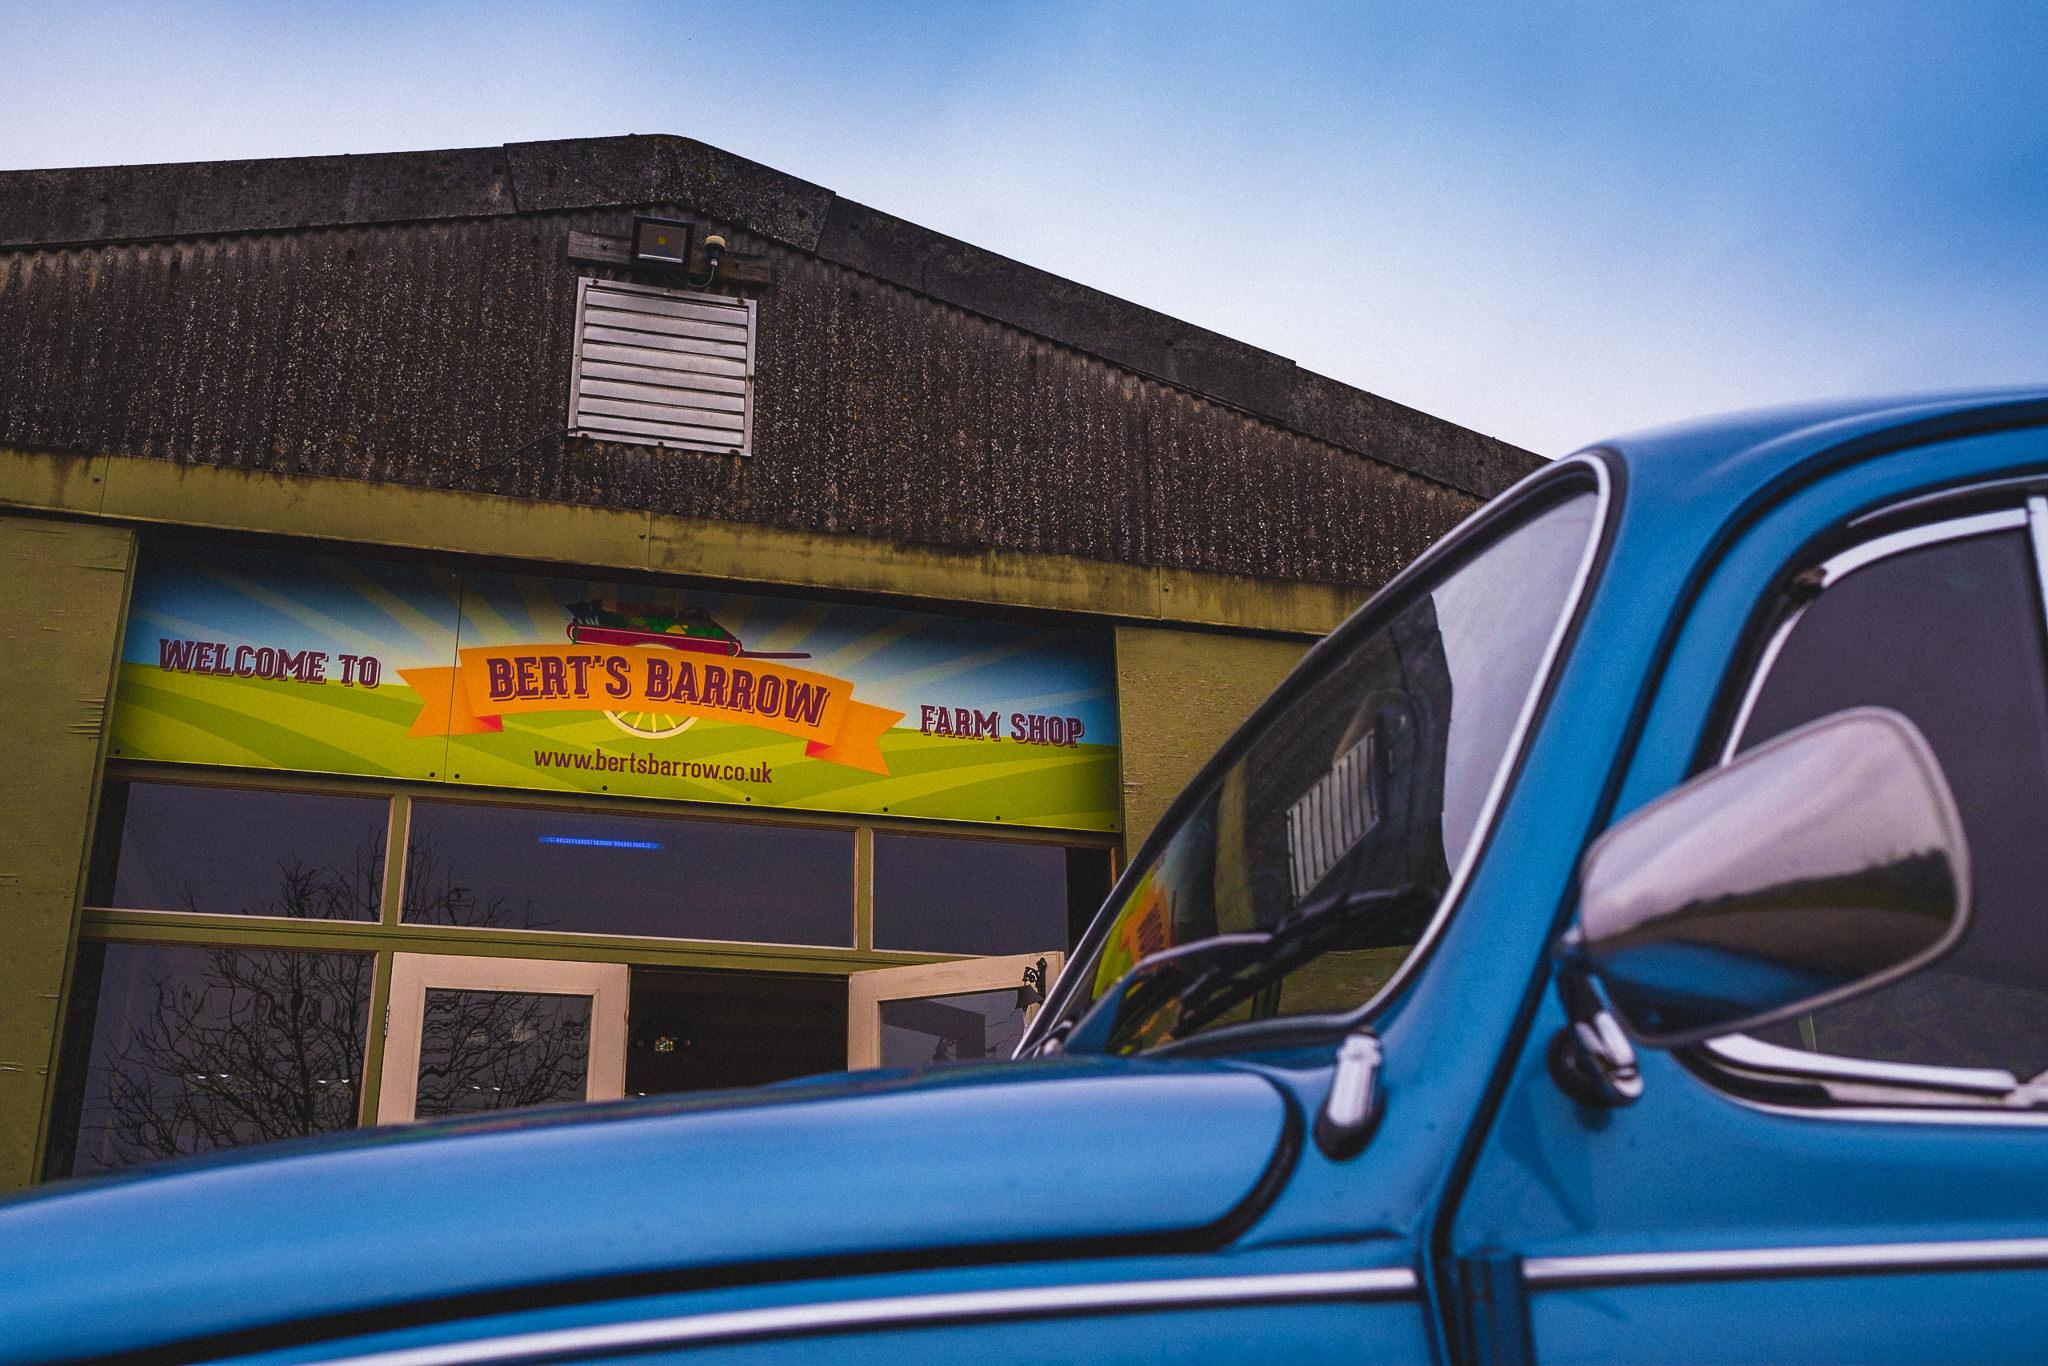 Vintage classic car parked outside Berts Barrow Farm